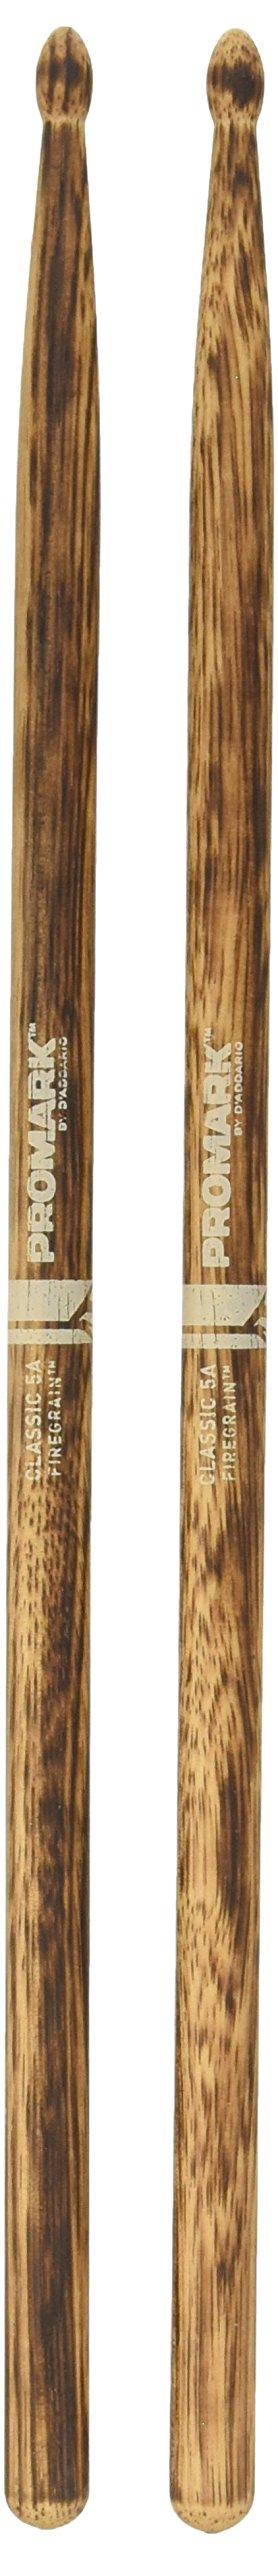 Promark TX5AW-FG FireGrain Classic 5A Drumsticks, Oval Tip